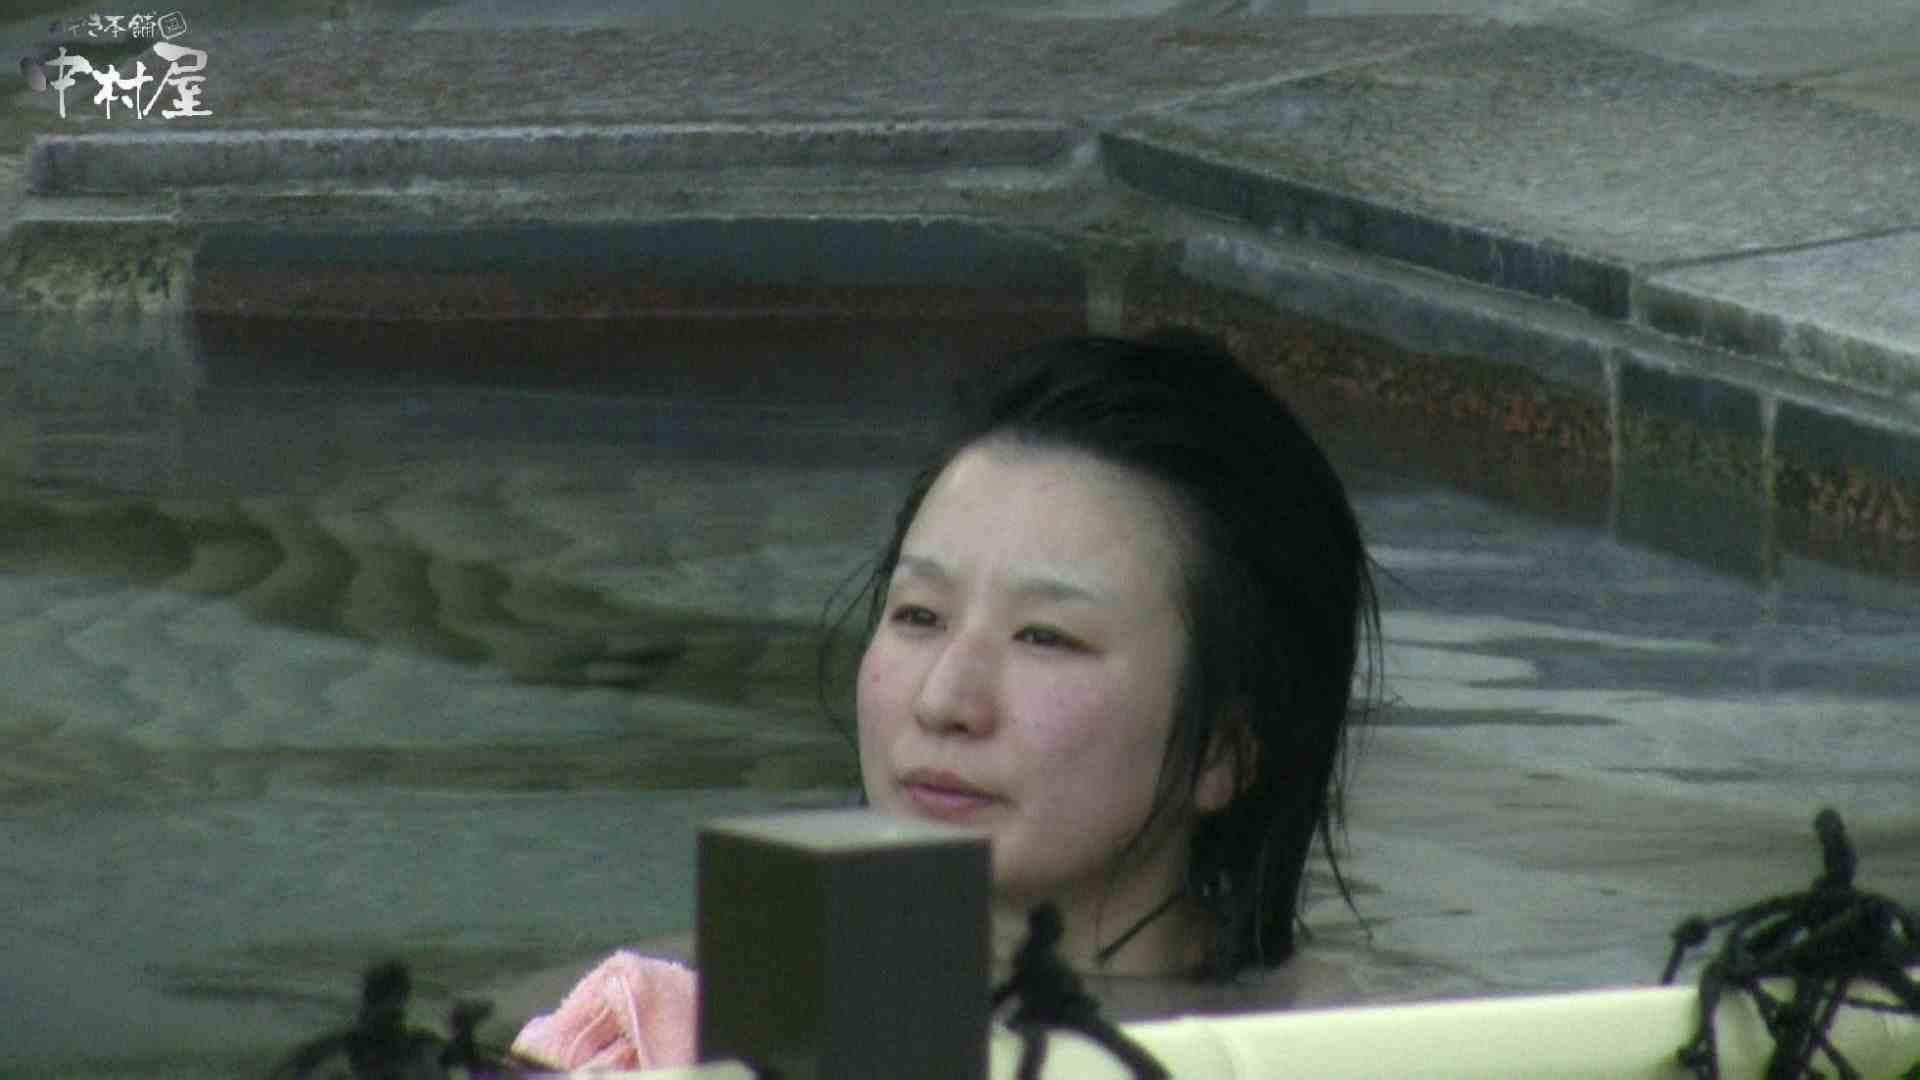 Aquaな露天風呂Vol.982 露天風呂突入 SEX無修正画像 78pic 38